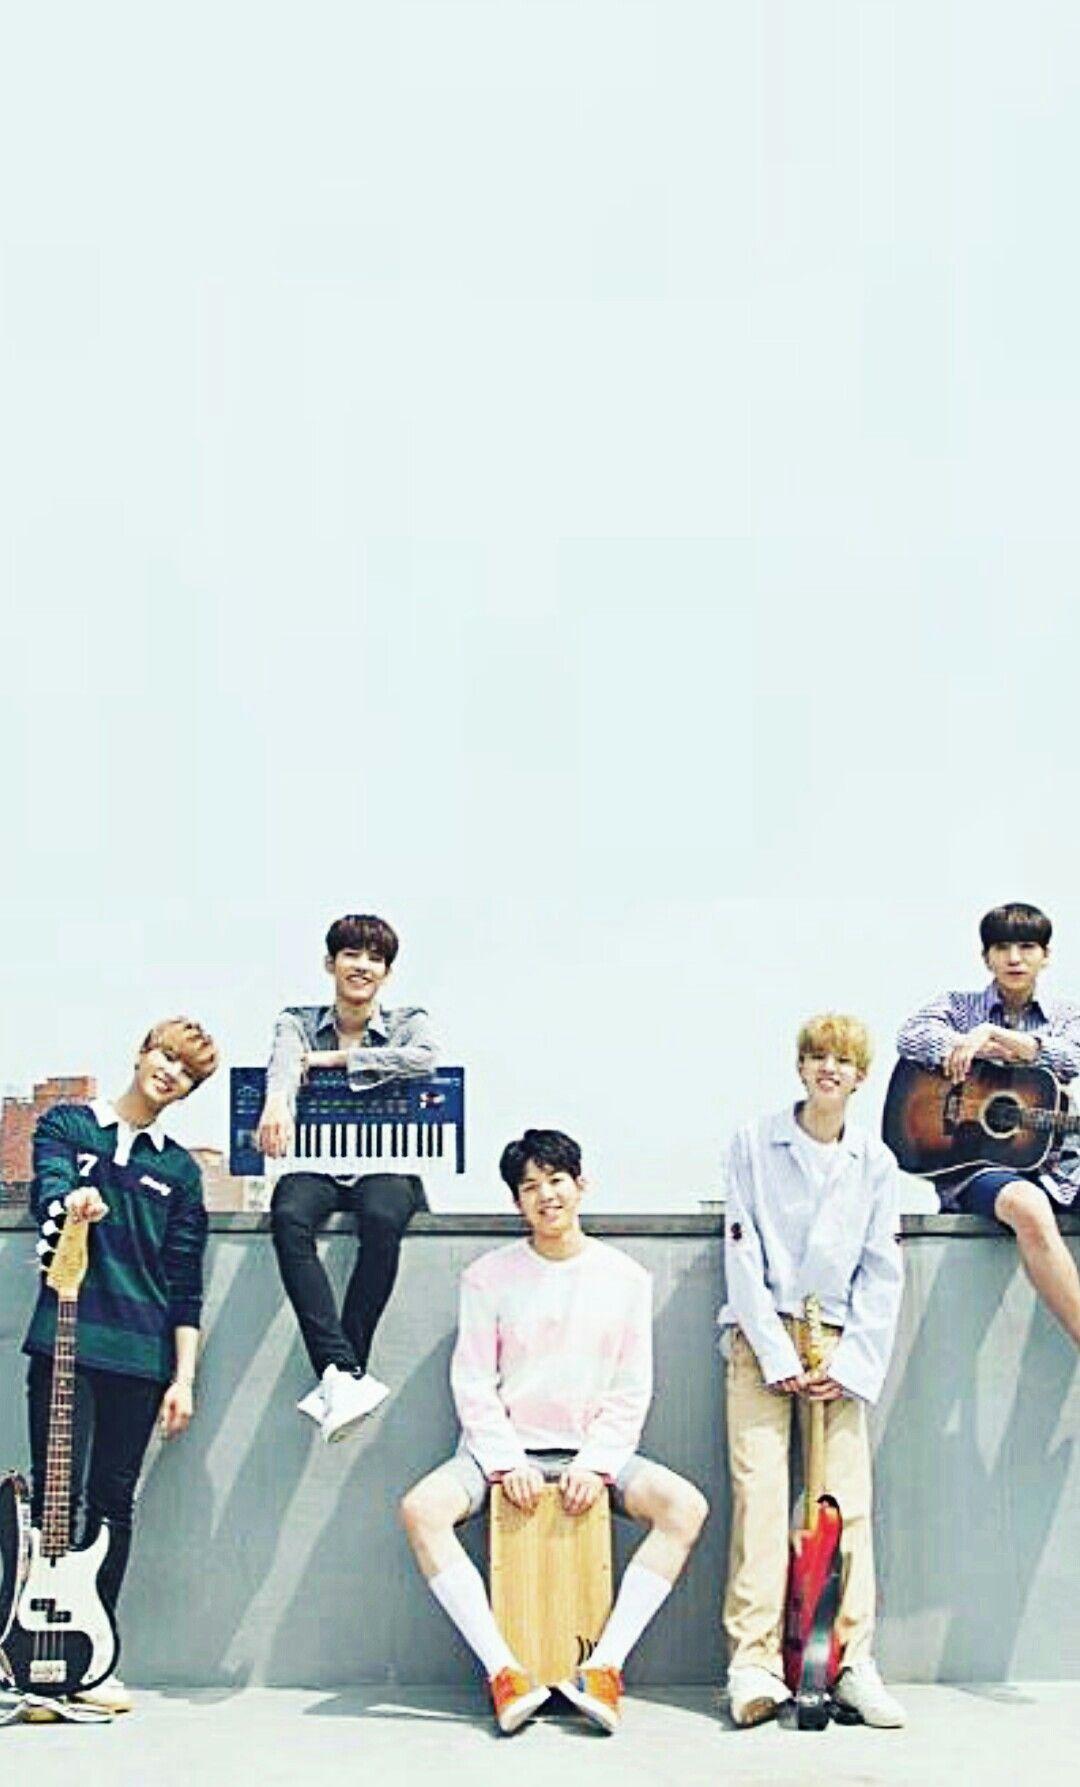 Day6 Membership Day6 Dowoon Day6membersprofile Day6 Members Leader Day6 Wallpaper Kpop Wallpaper